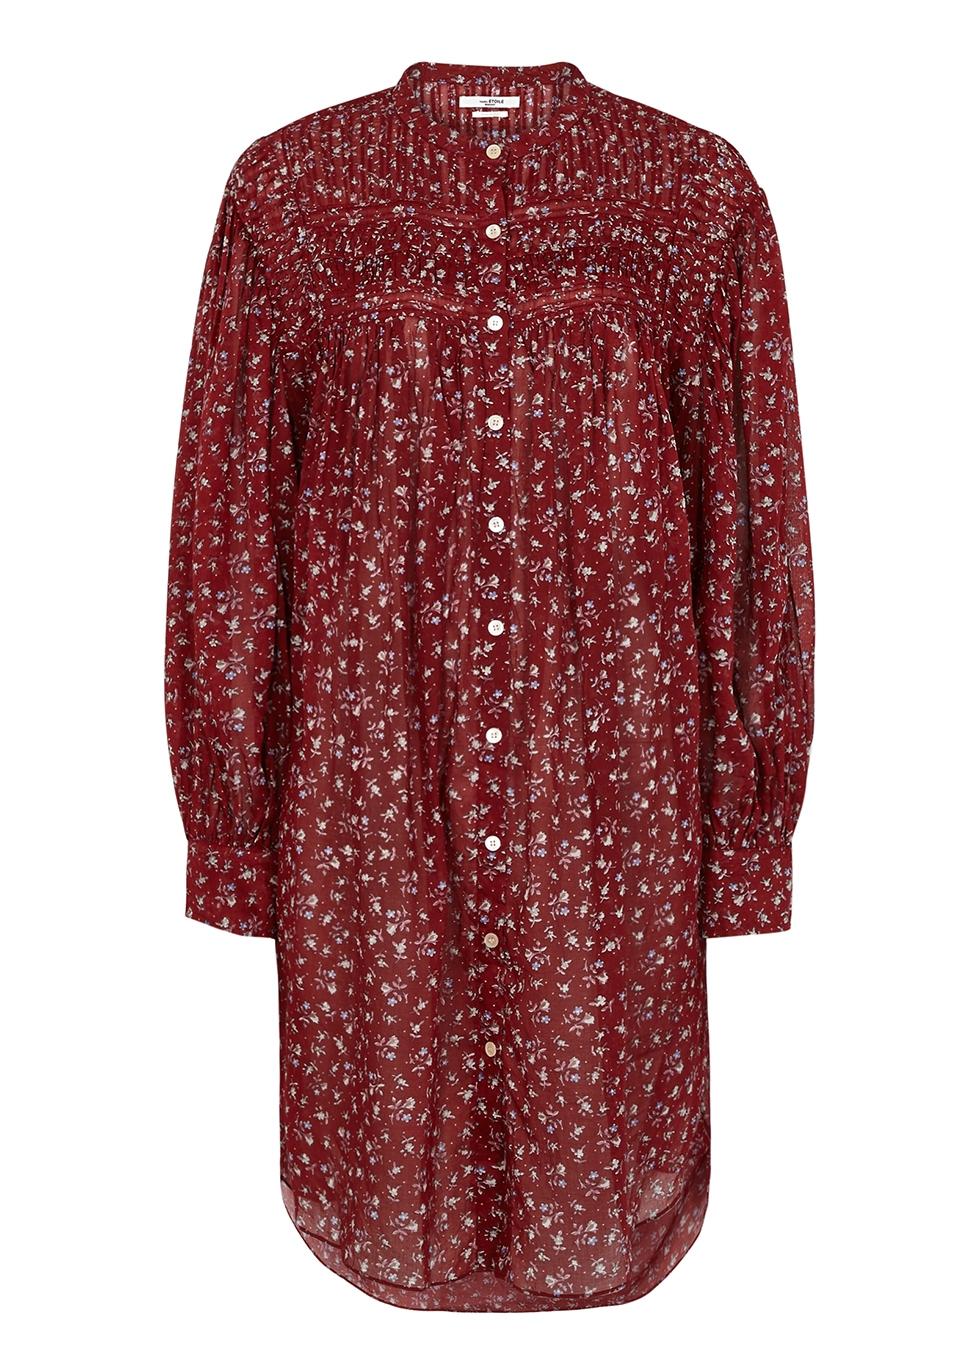 Plana red floral-print cotton dress